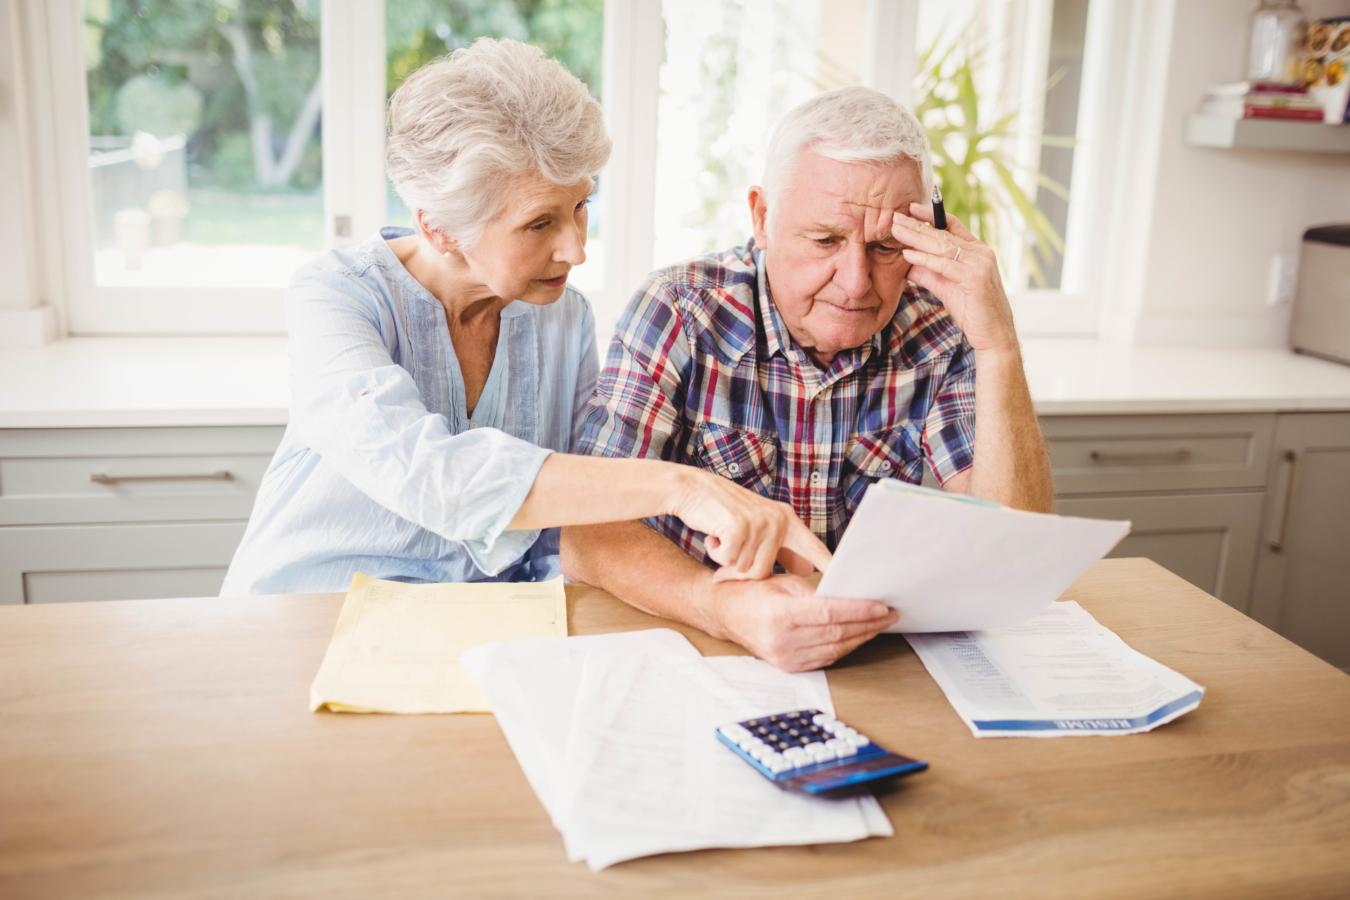 photodune-15037914-worried-senior-couple-checking-their-bills-at-home-l-e1468115927637